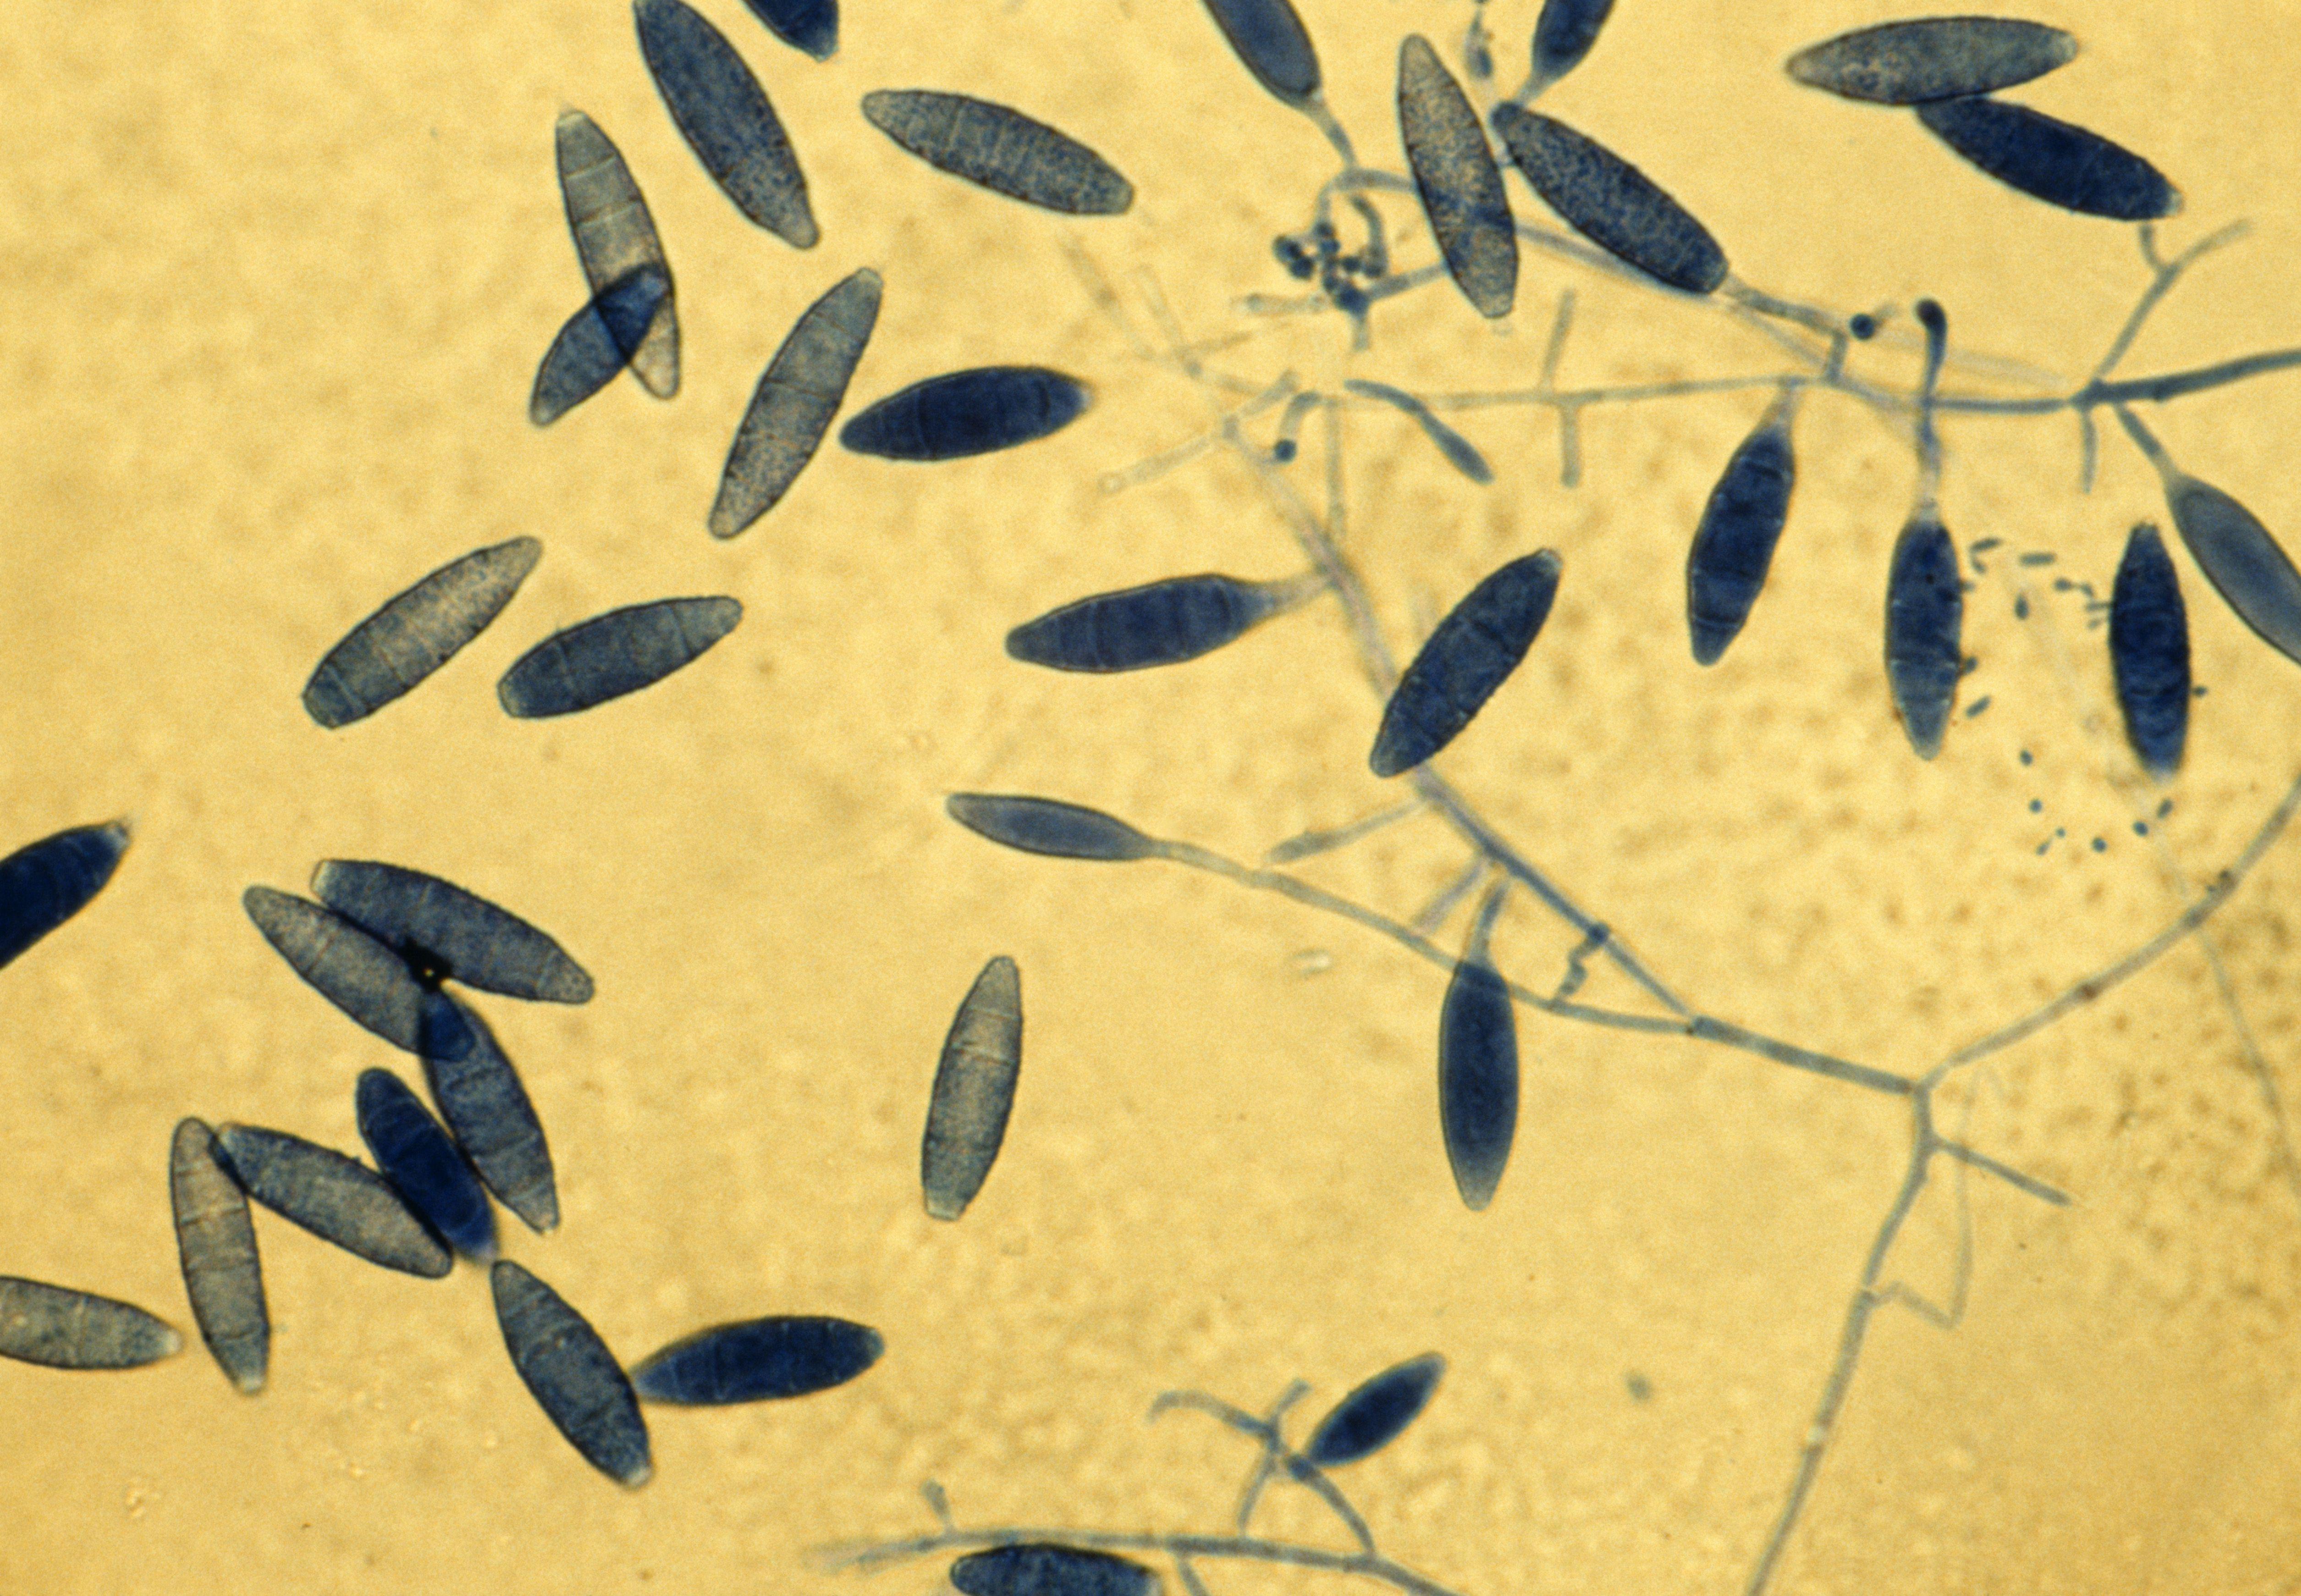 Light micrograph of the ringworm fungus